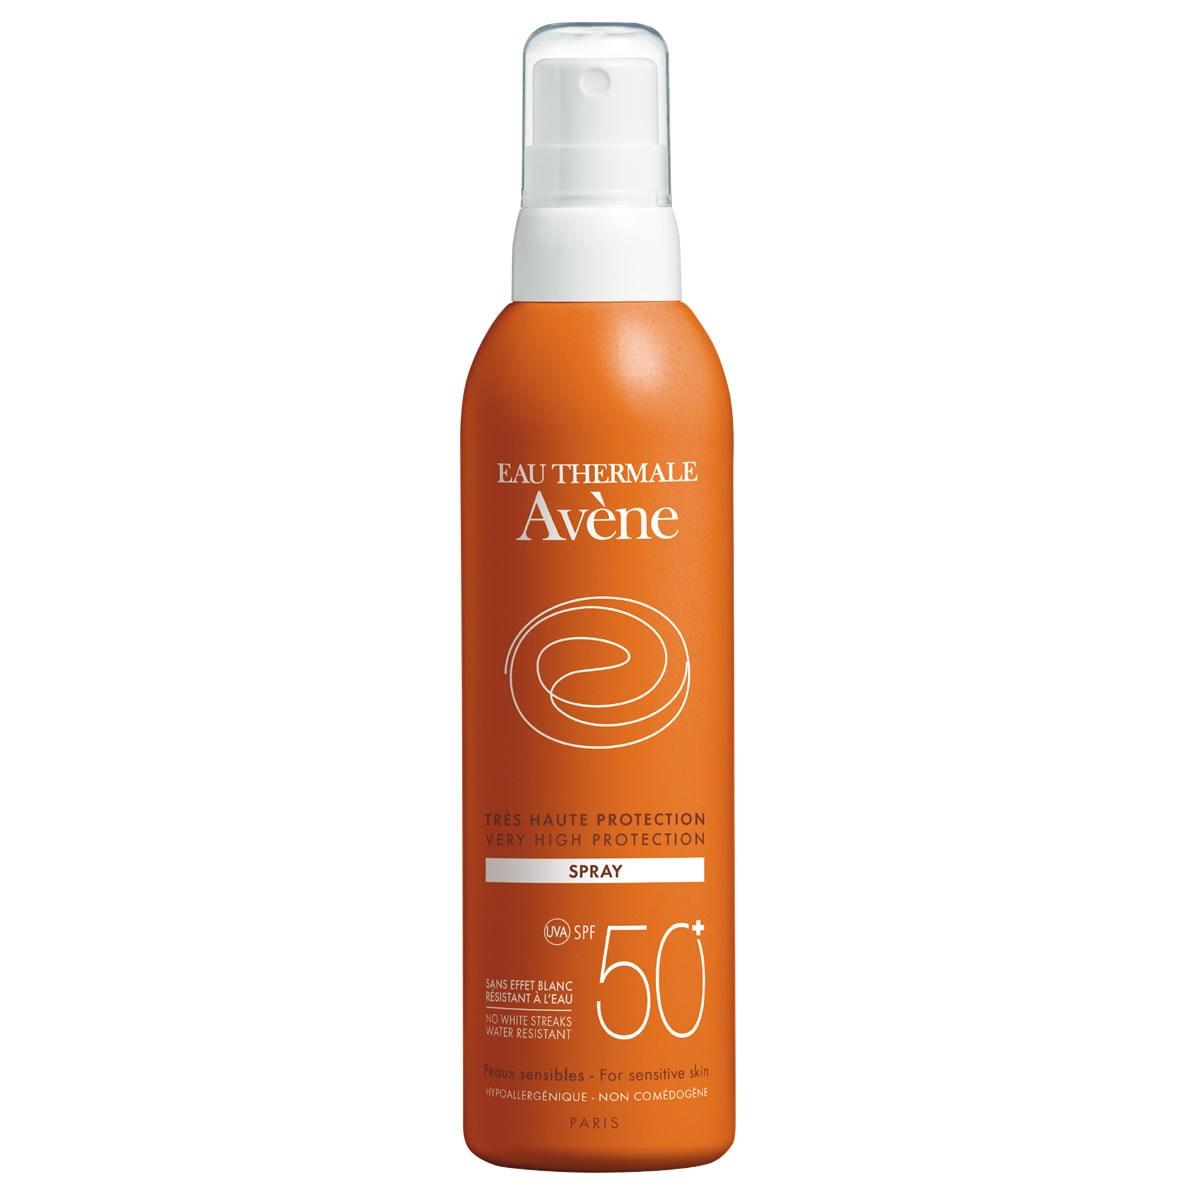 Avene Very High Protection Spray SPF 50+